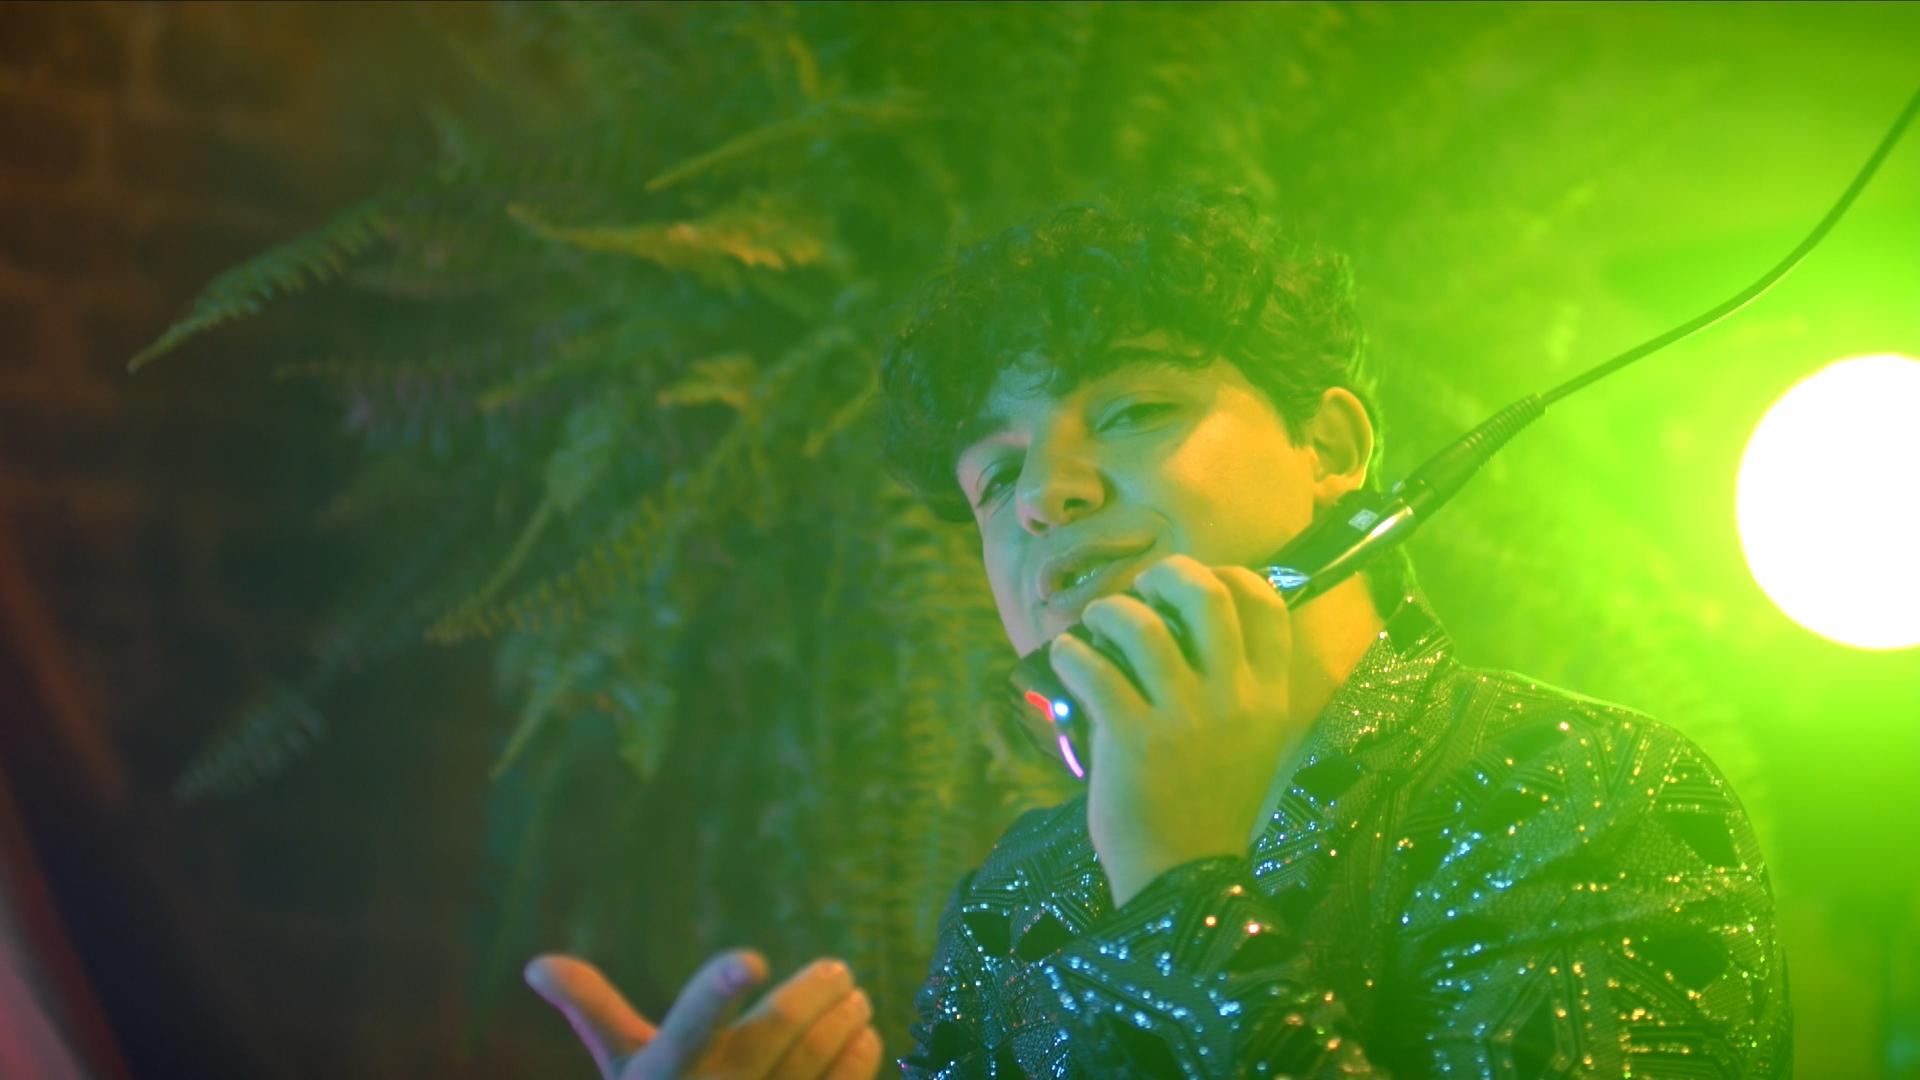 Cantor e compositor Rossini lança seu clipe TEQUILA